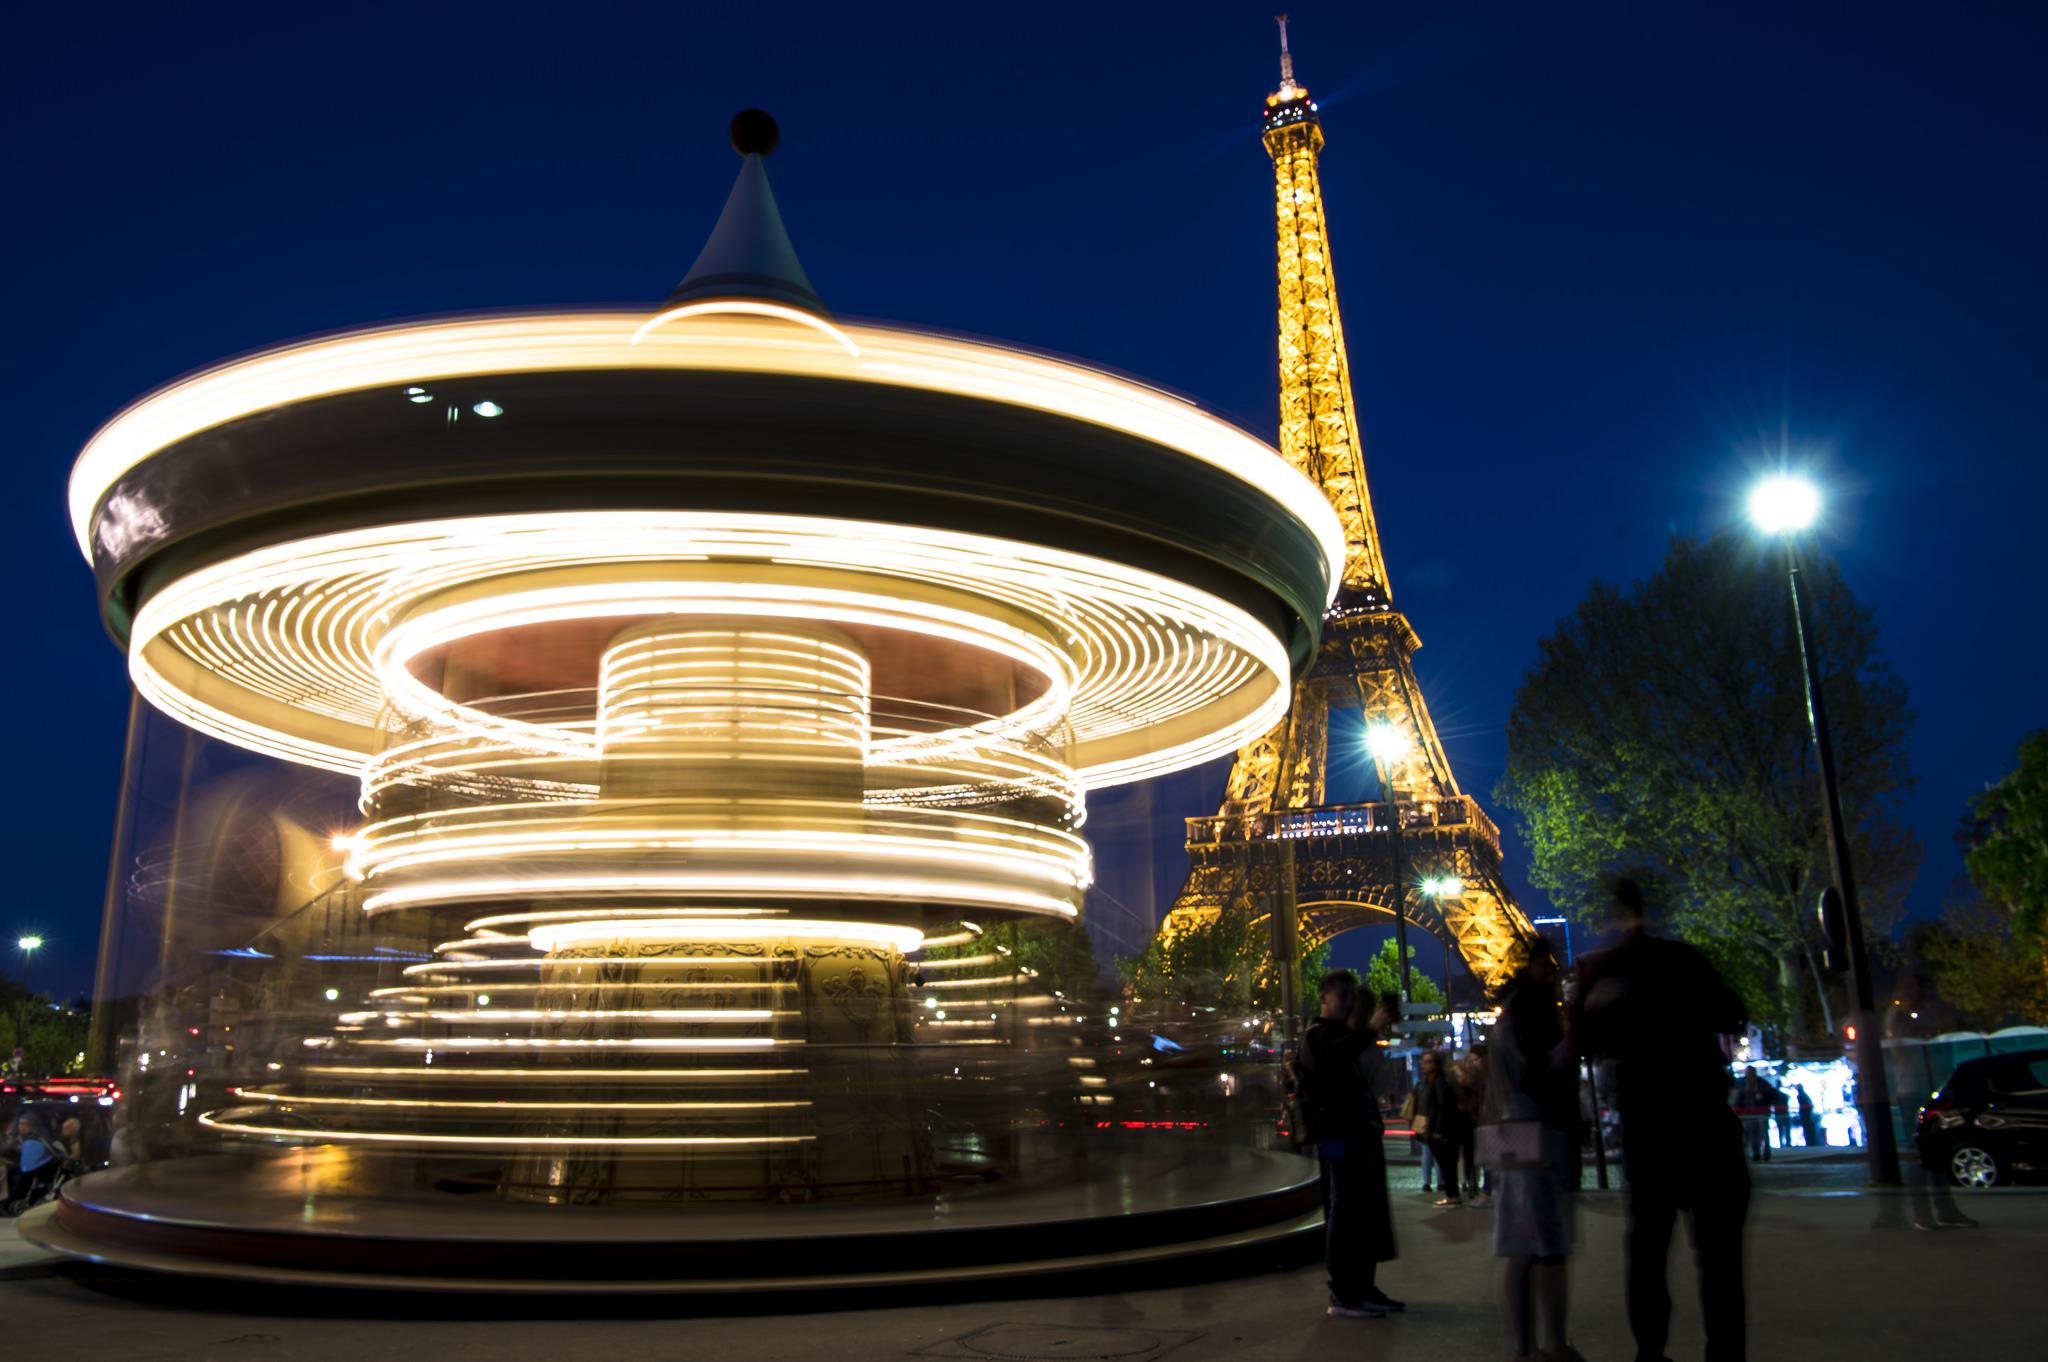 Carousel - Paris